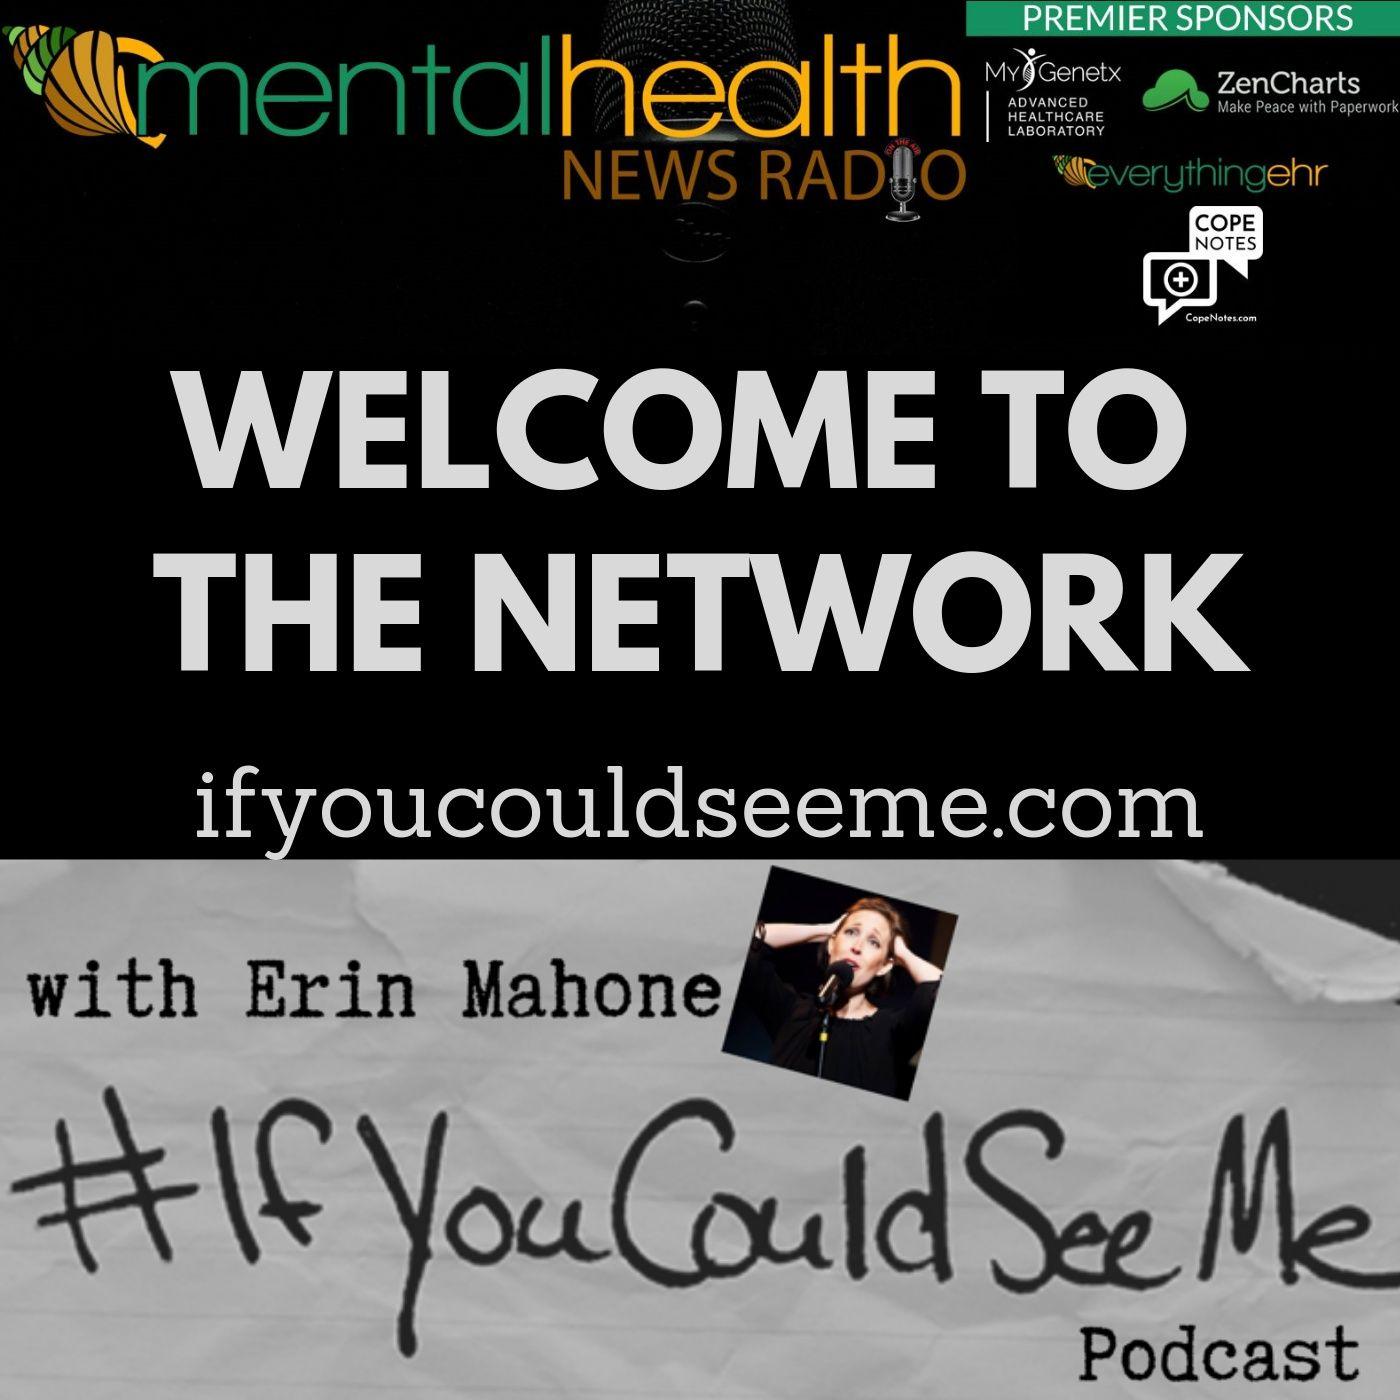 Mental Health News Radio - #ifyoucouldseeme with Erin Mahone